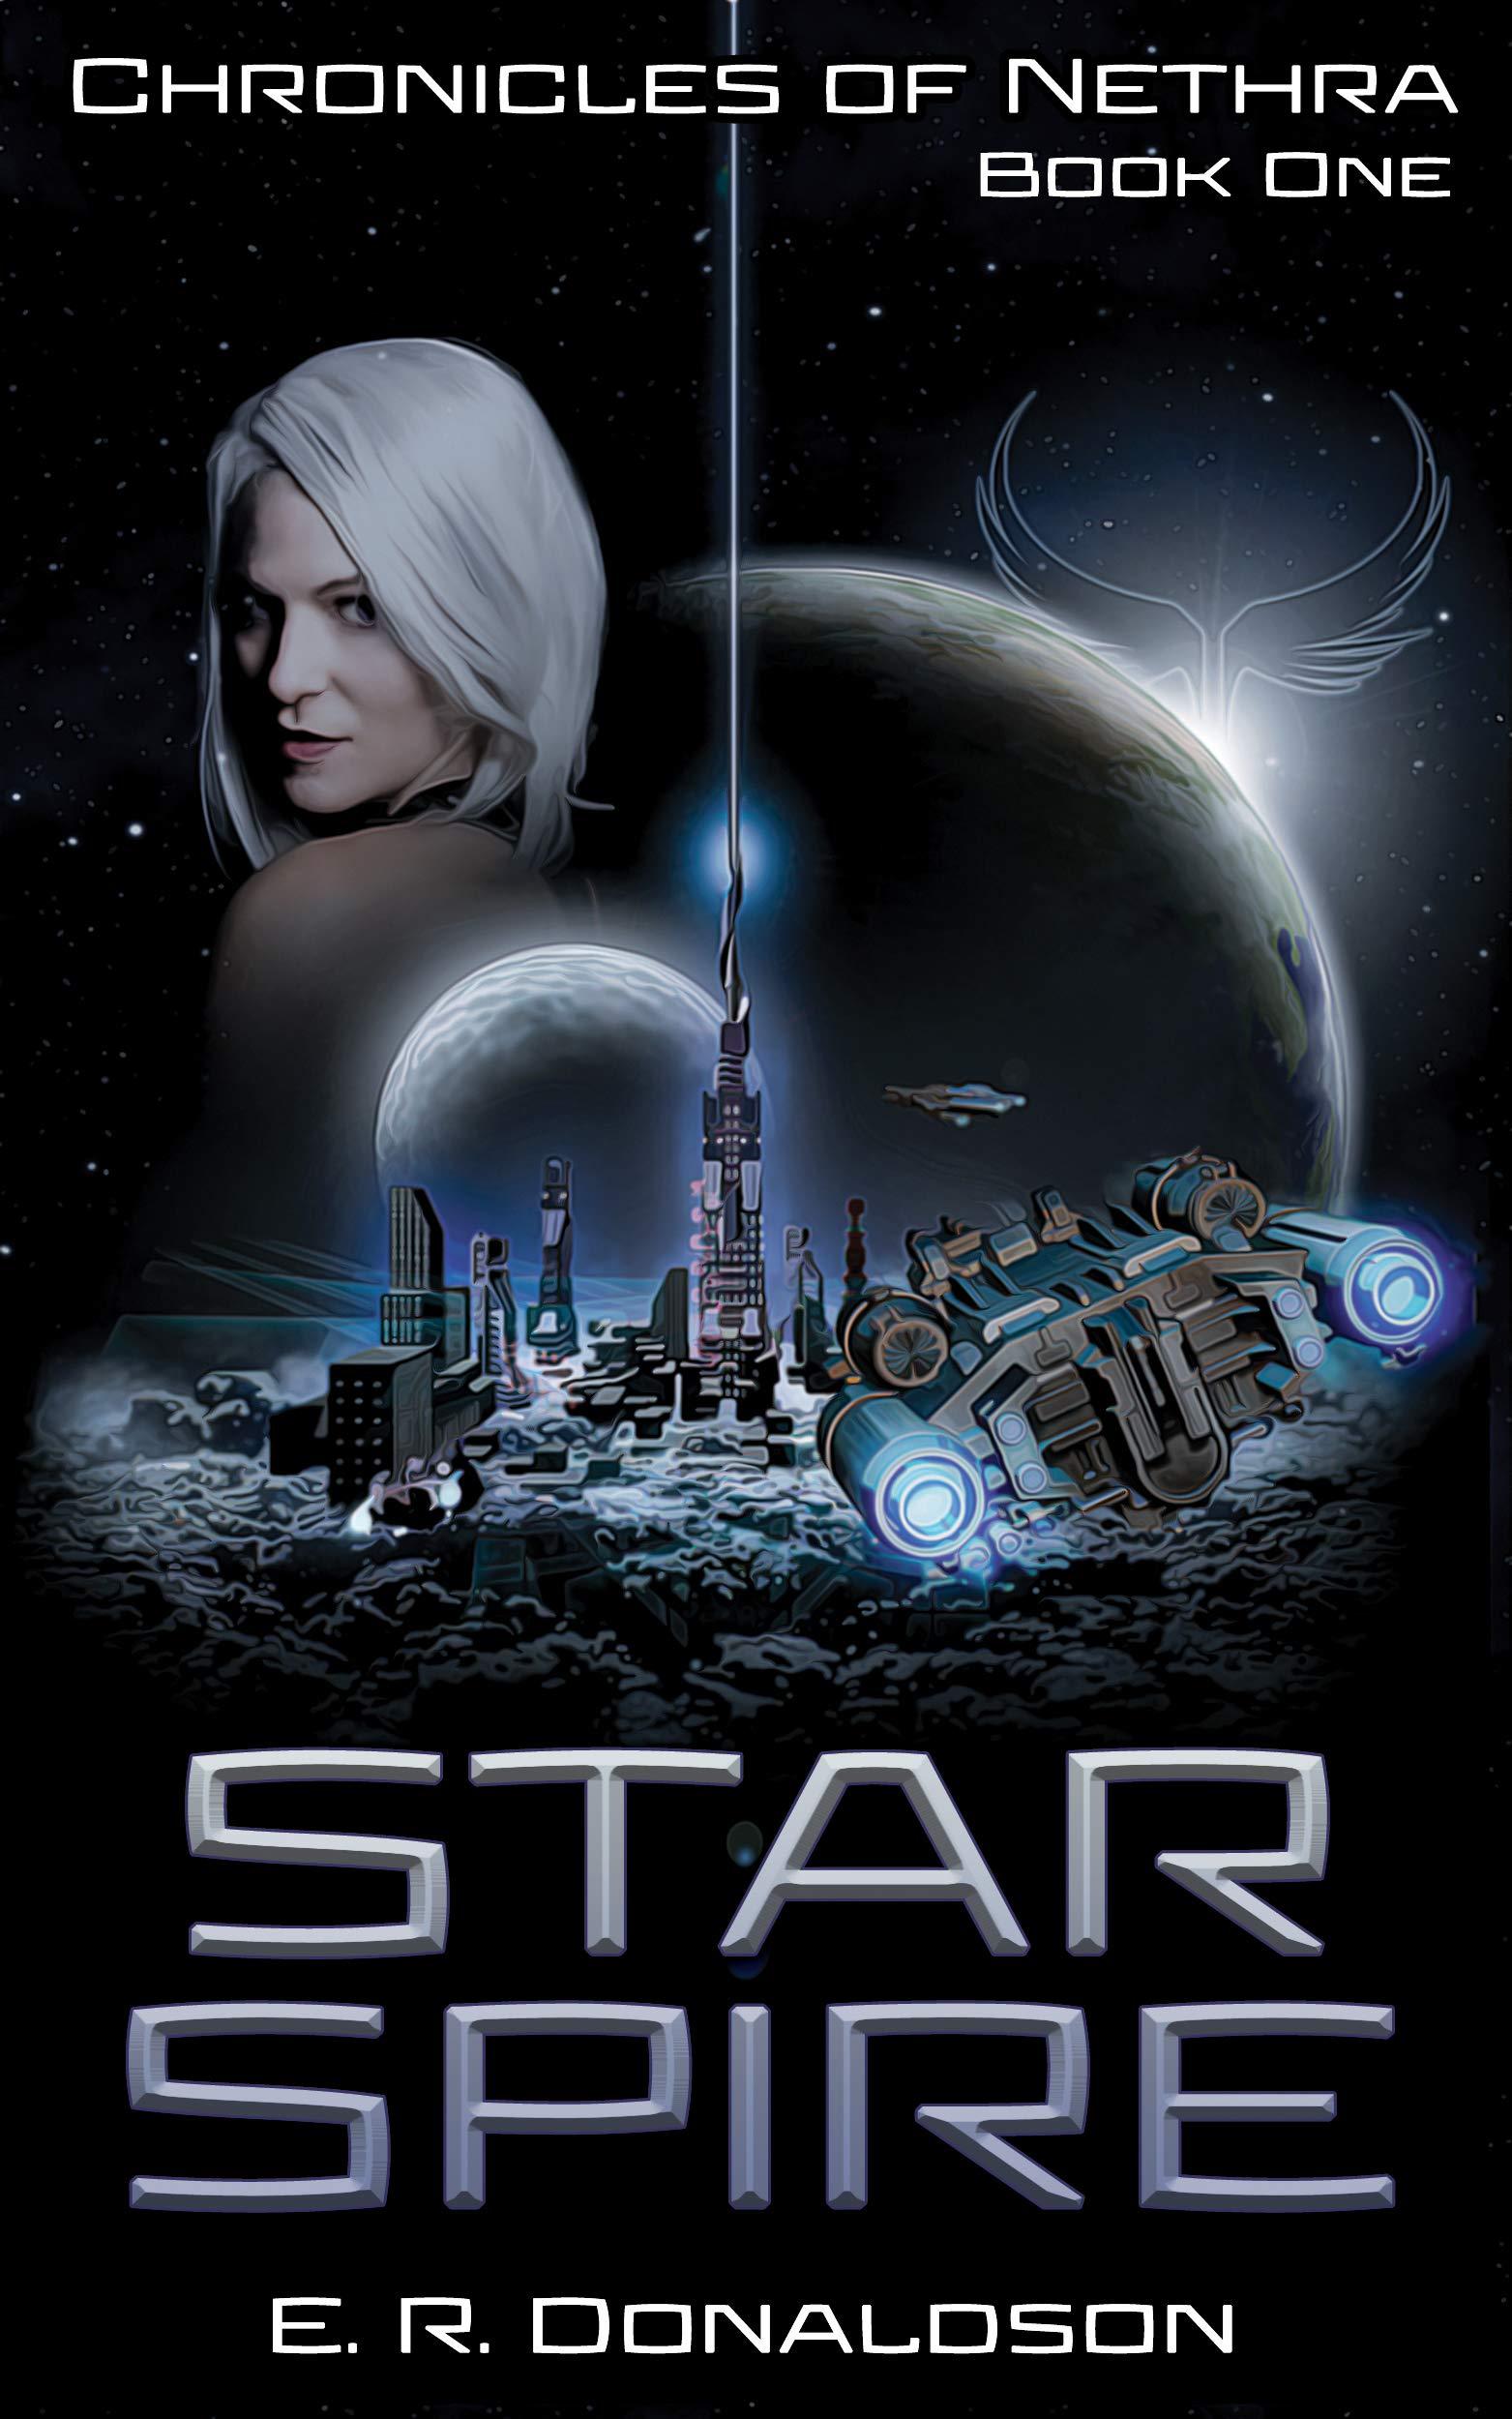 Star Spire (Chronicles of Nethra Book 1) E.R. Donaldson